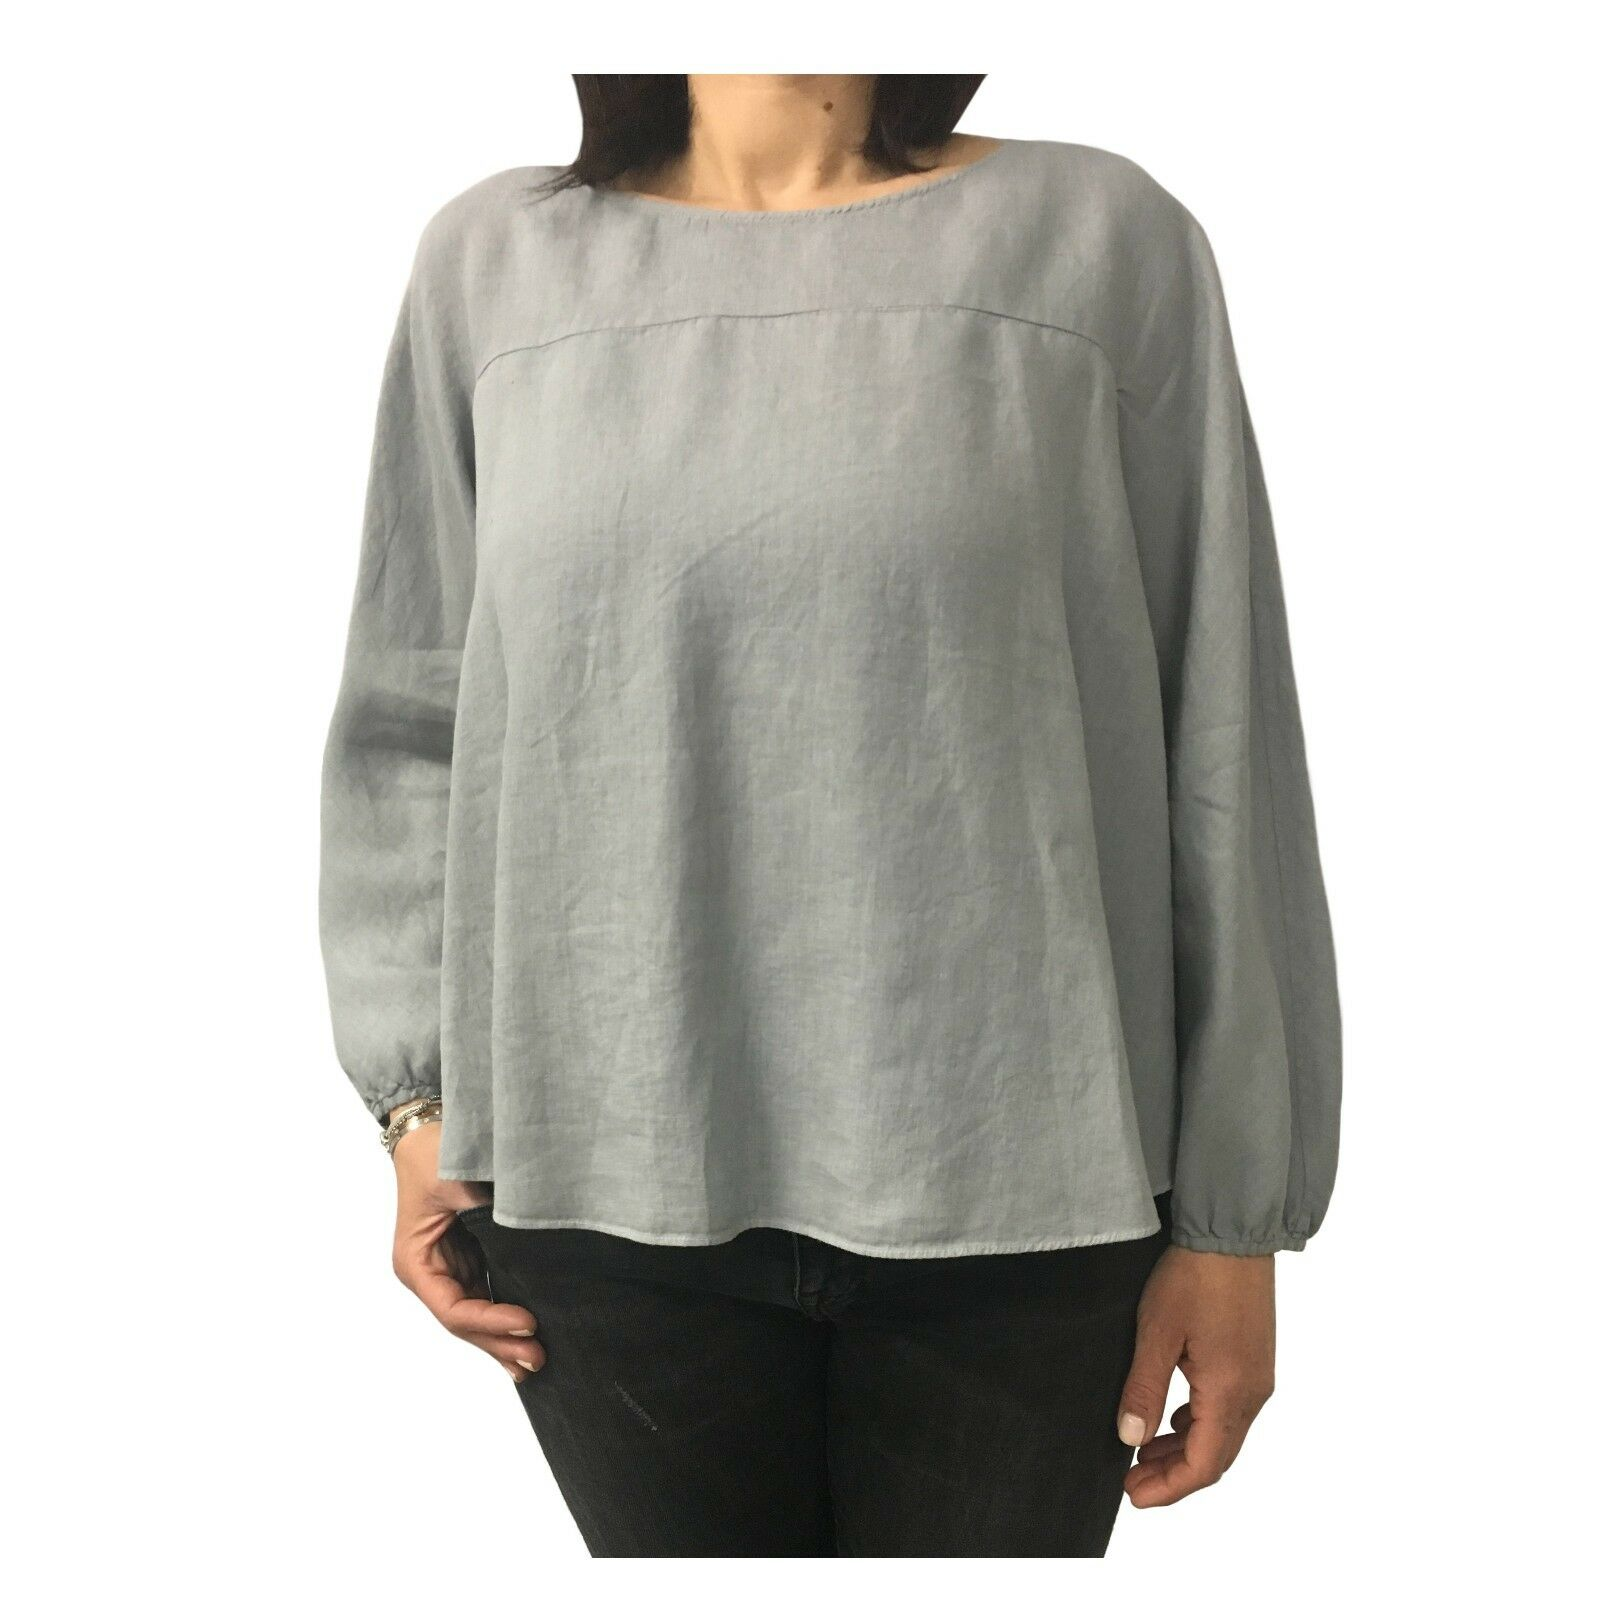 ASPESI Damenhemd grau mod H718 C195 100% Leinen